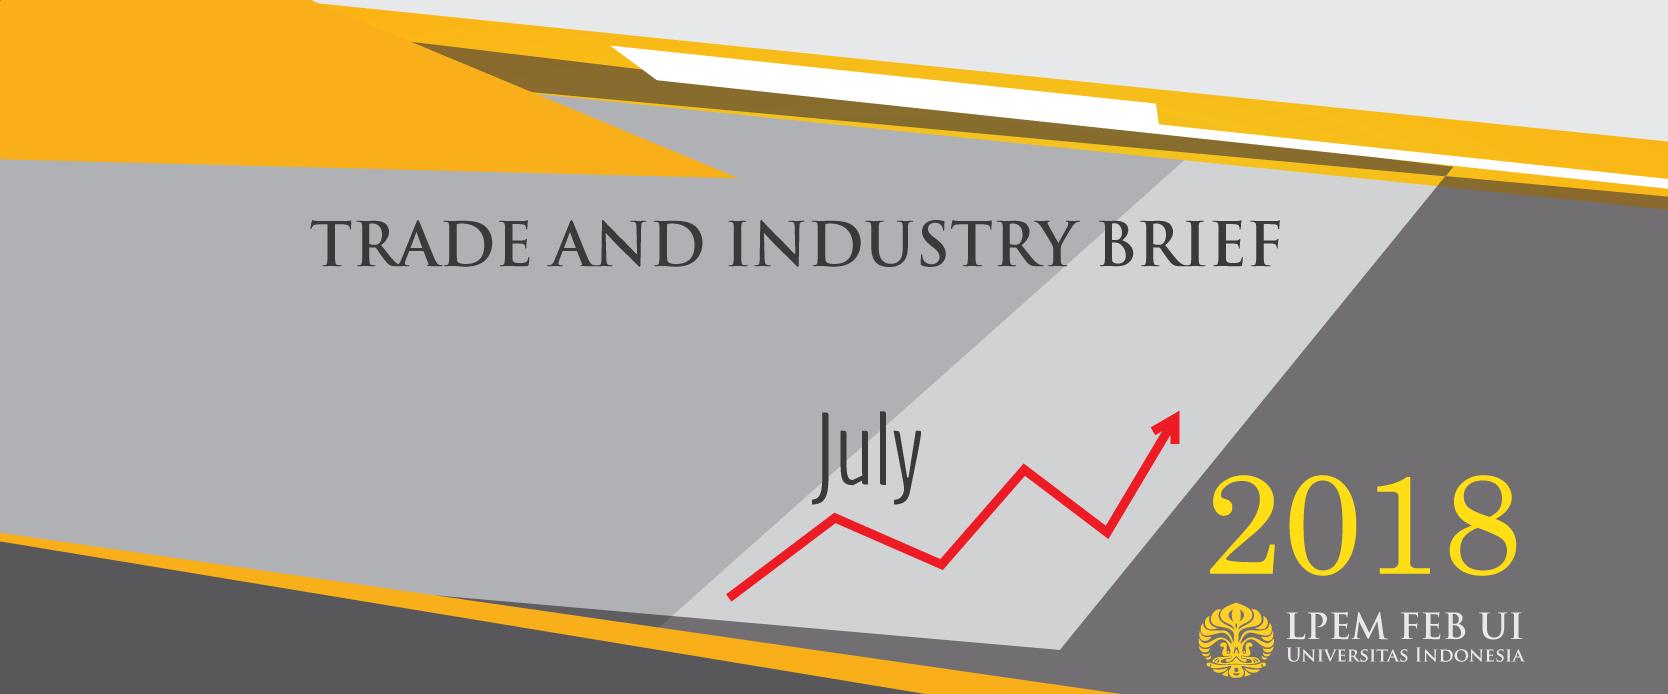 SERI ANALISIS EKONOMI: TRADE AND INDUSTRY BRIEF, Juli 2018